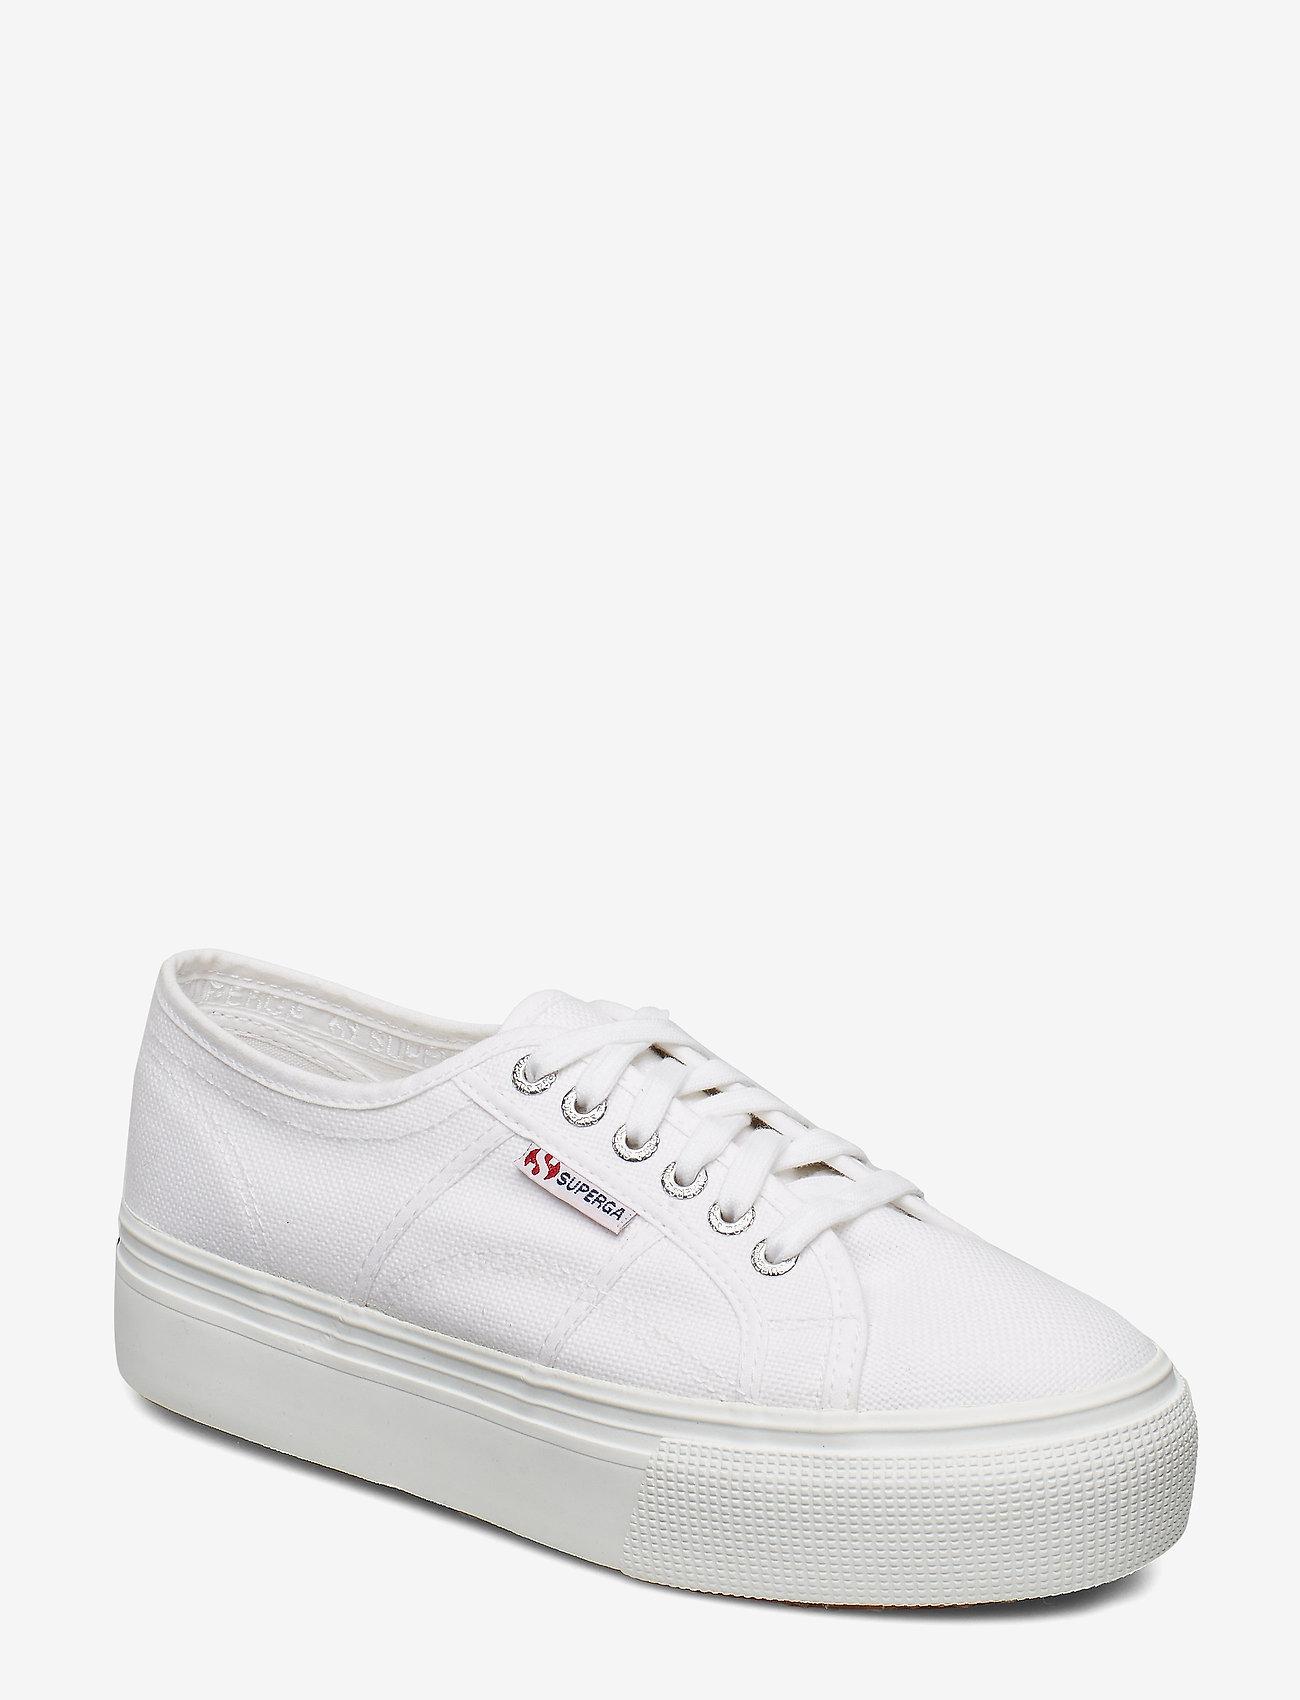 Superga - Superga 2790-Acotw Linea - låga sneakers - white - 0